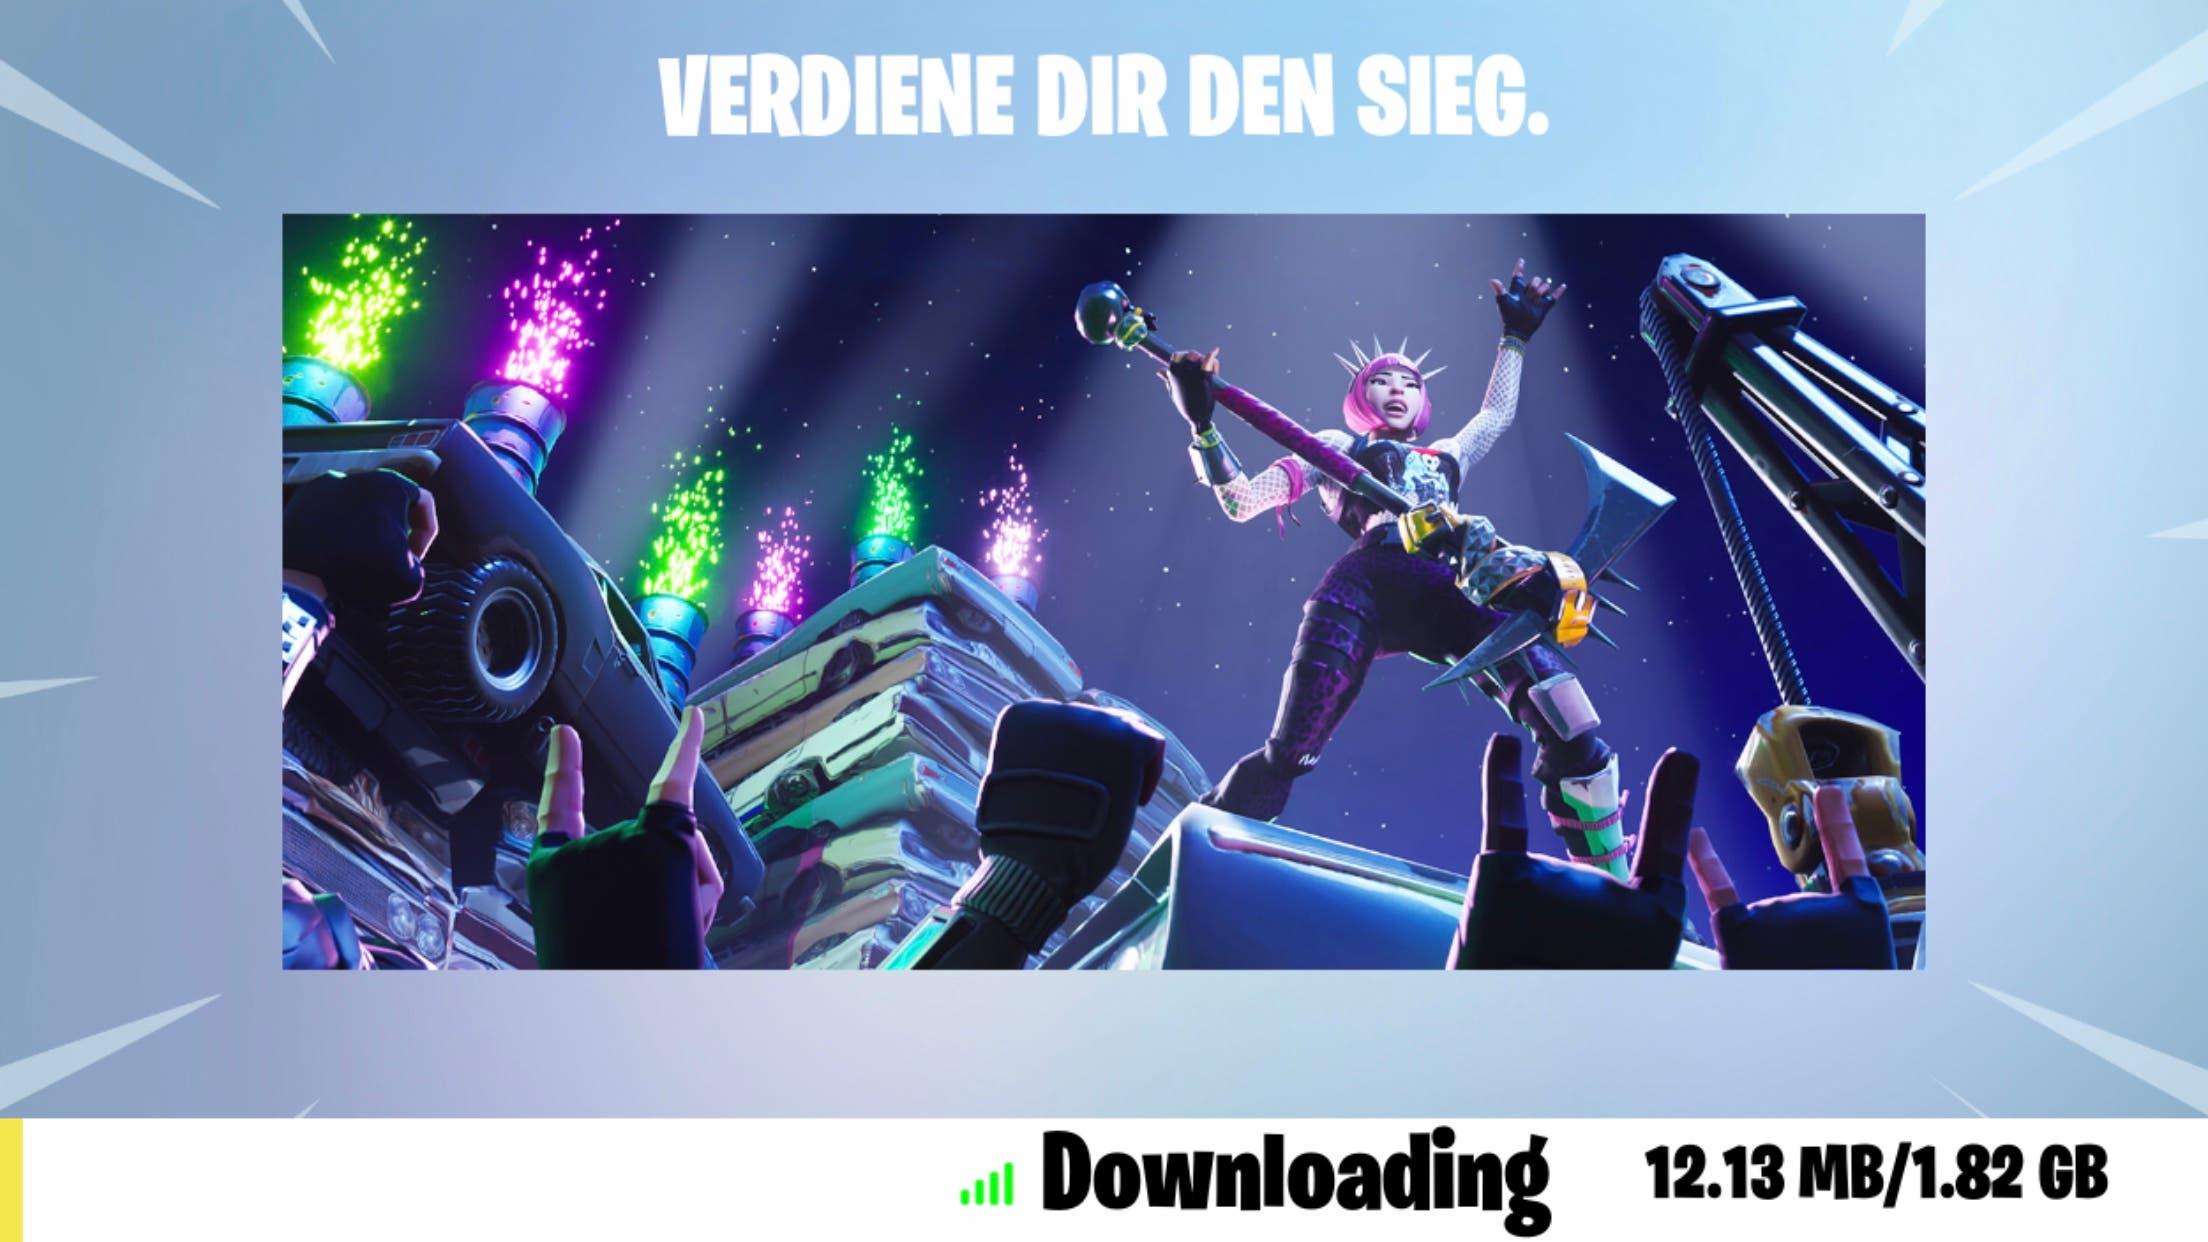 Fortnite 5.0 Update Download auf iPhone 7 Plus